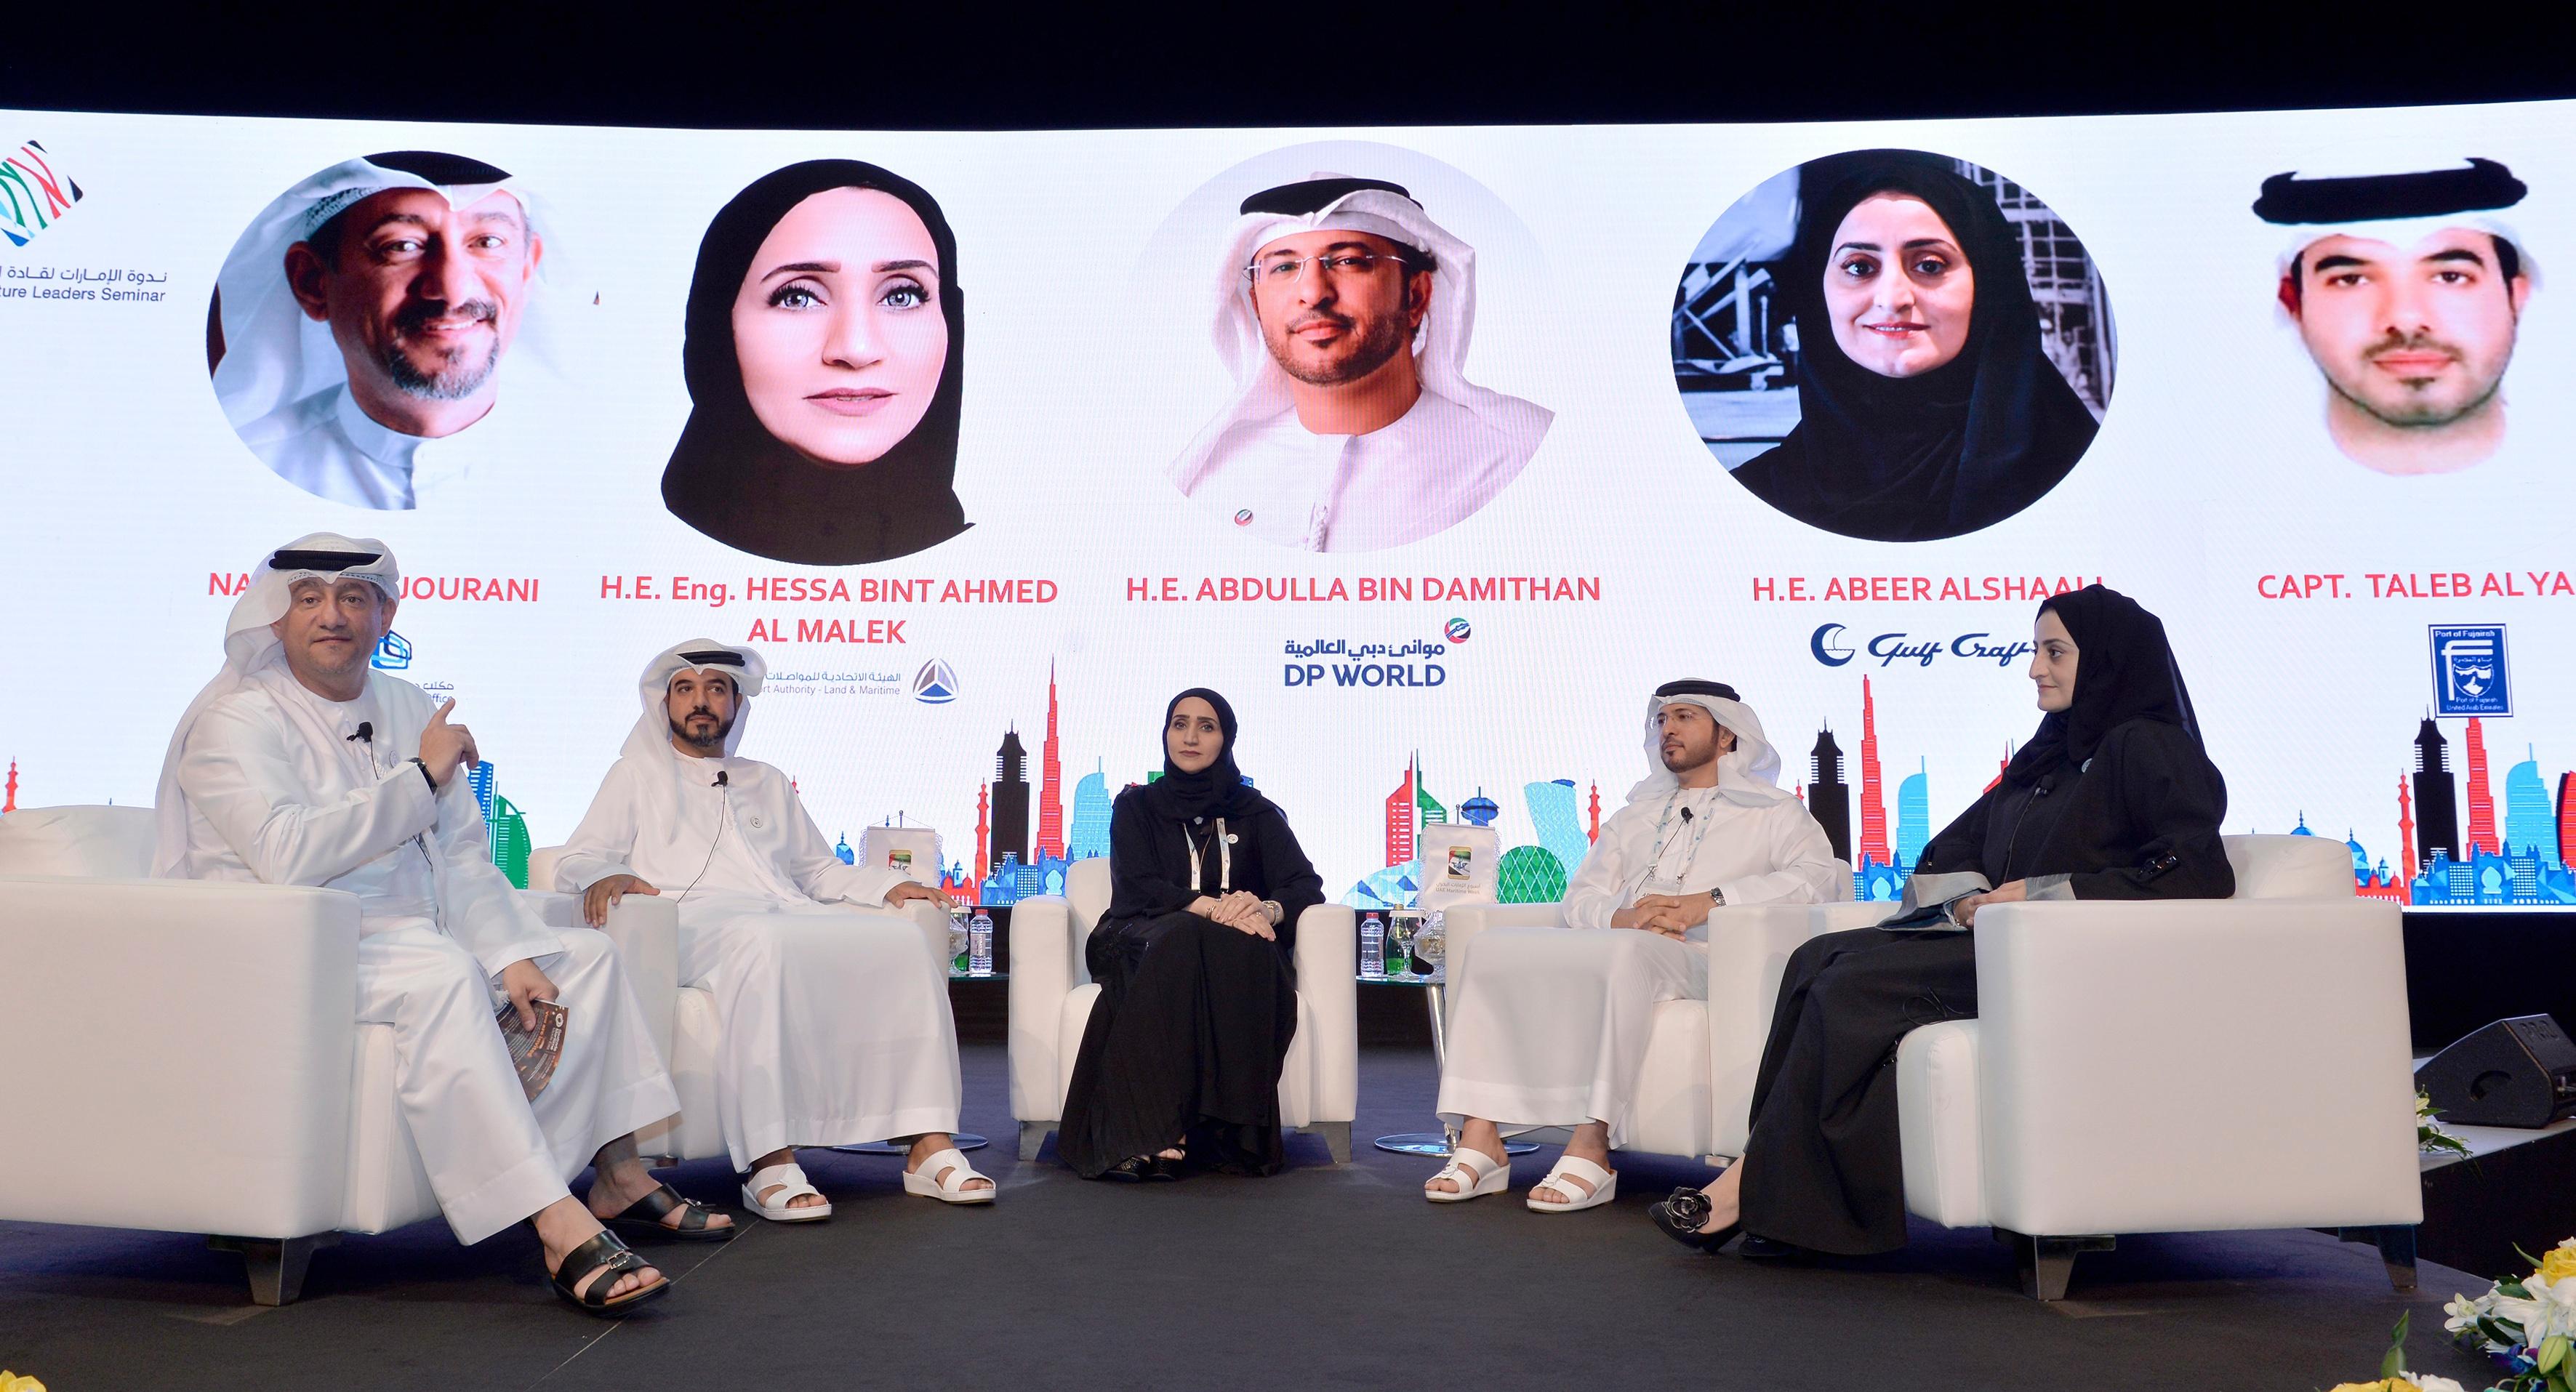 Dubai Maritime Week 2018, Abeer Alshaali, Gulf Craft